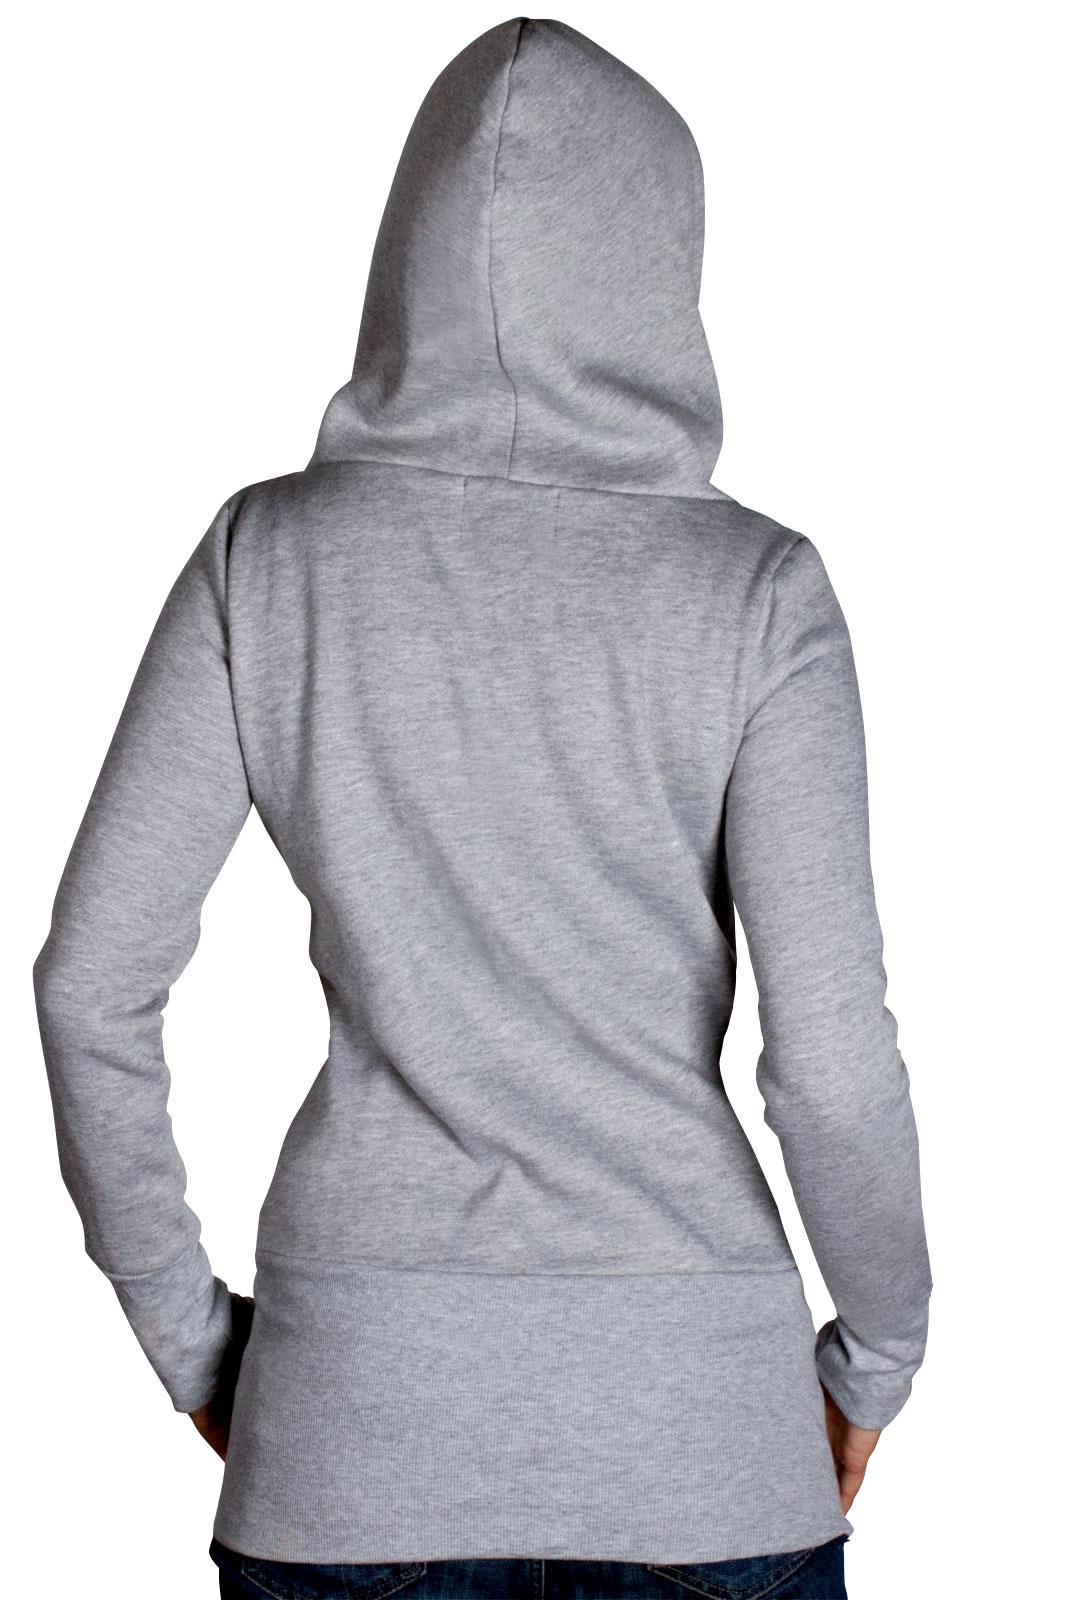 womens hoodie hooded sweater coat hooded sweater jacket. Black Bedroom Furniture Sets. Home Design Ideas